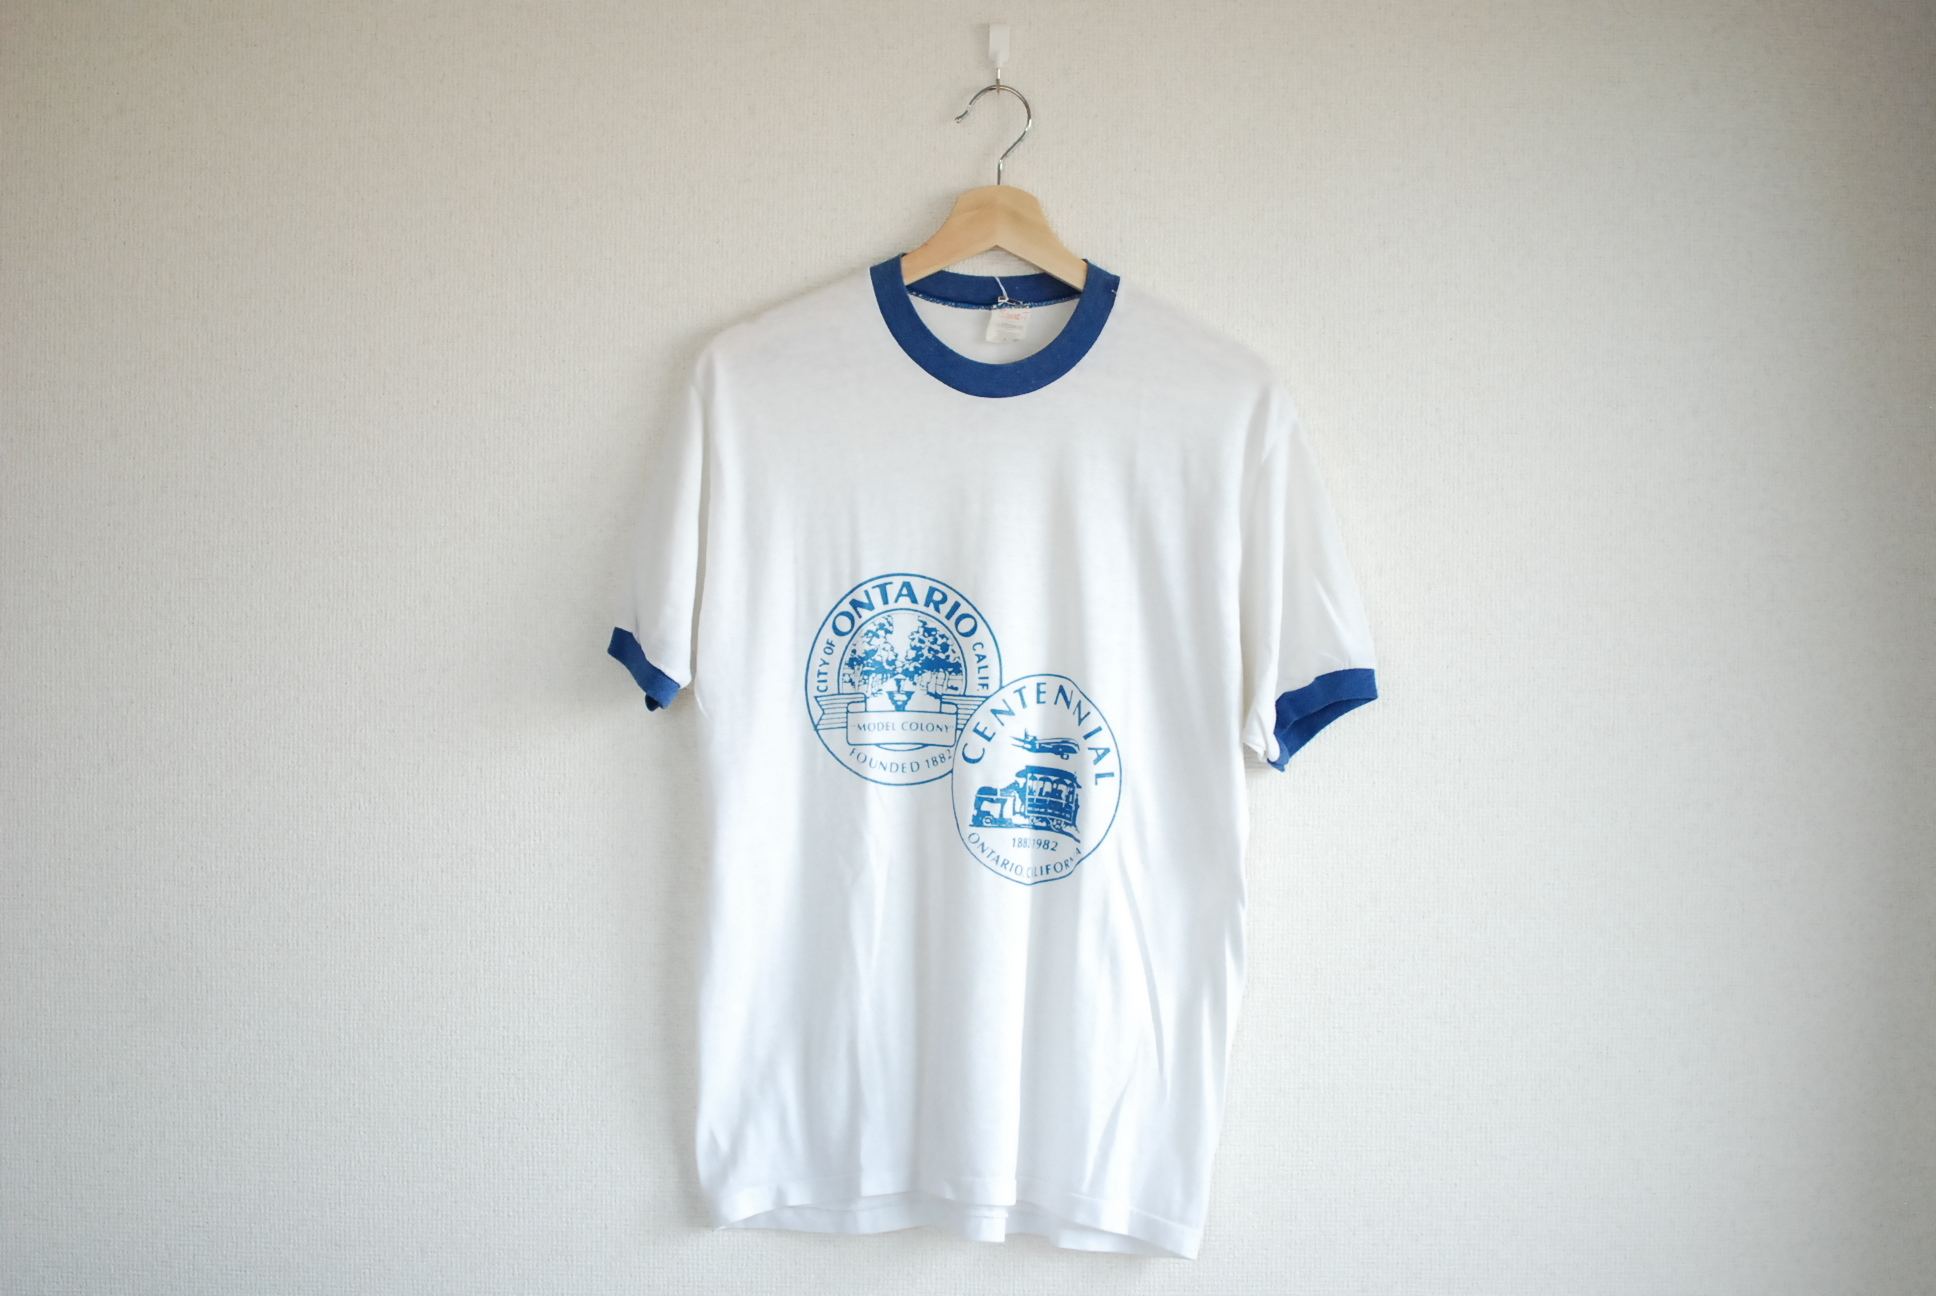 【UNISEX】VINTAGE ONTARIO City Ringer T-shirt